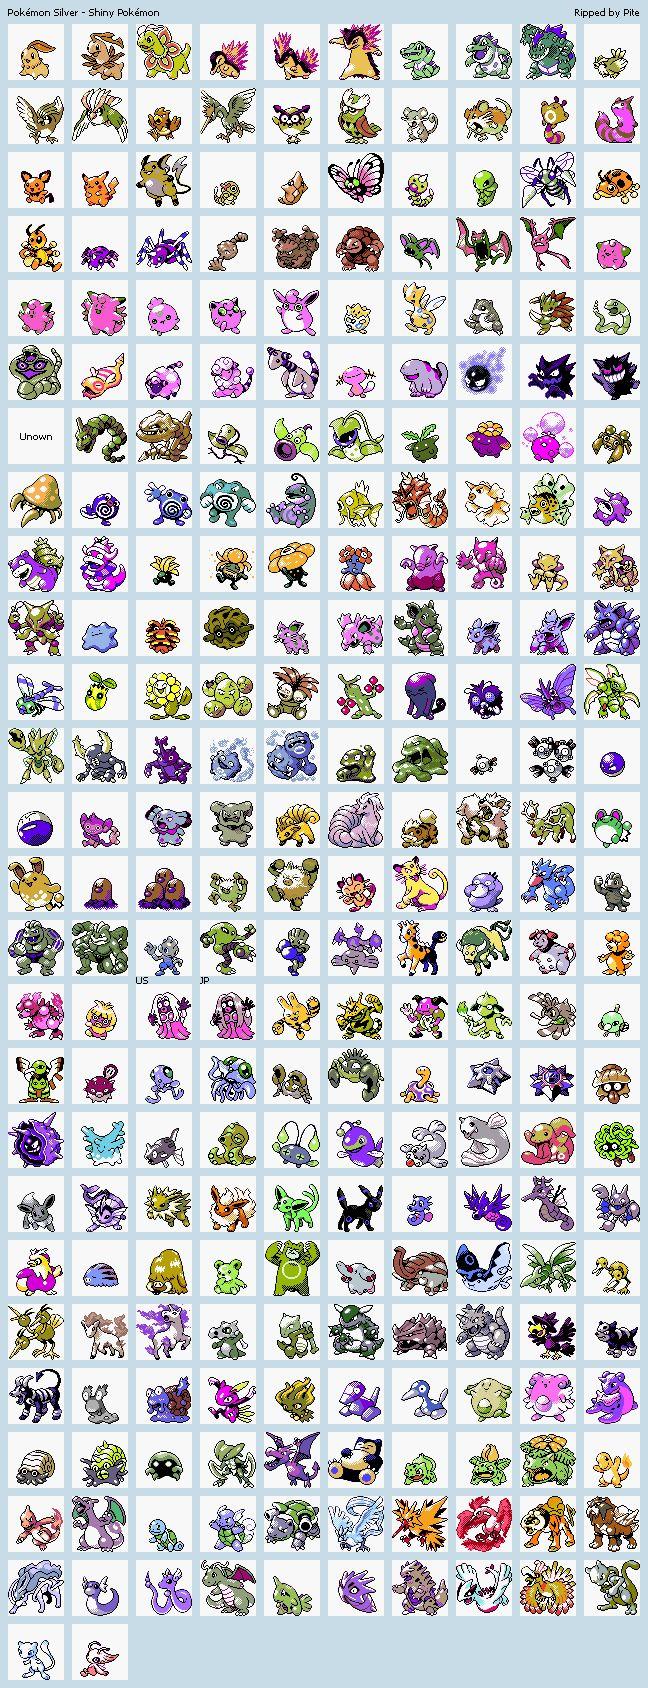 Pokemon silver version shiny pok mon pinterest - Pokemon argent pokemon rare ...